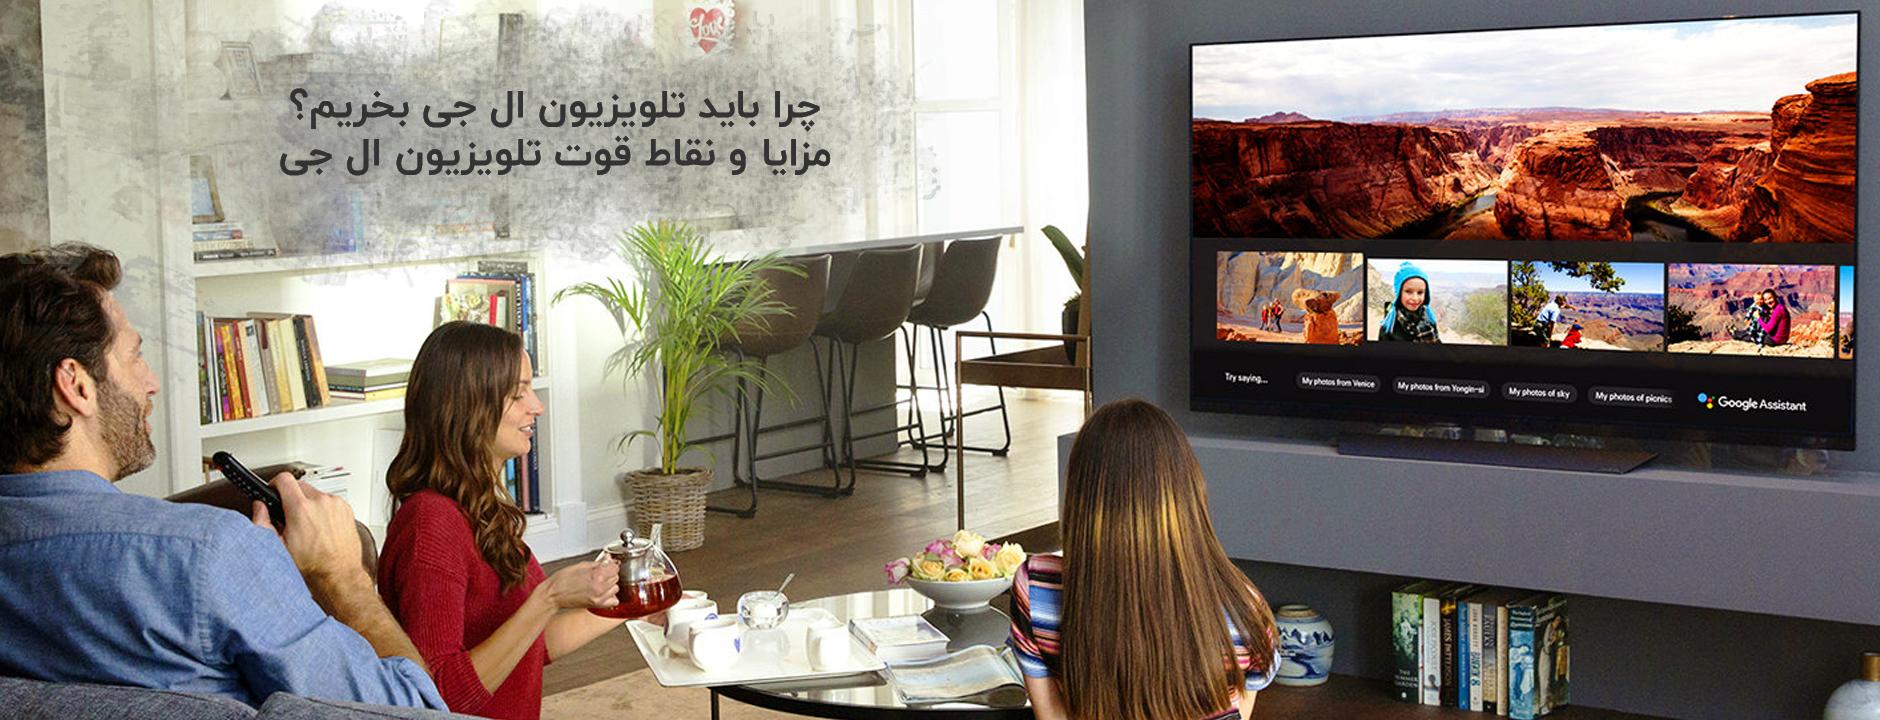 چرا باید تلویزیون ال جی بخریم؟ نقاط قوت تلویزیون ال جی